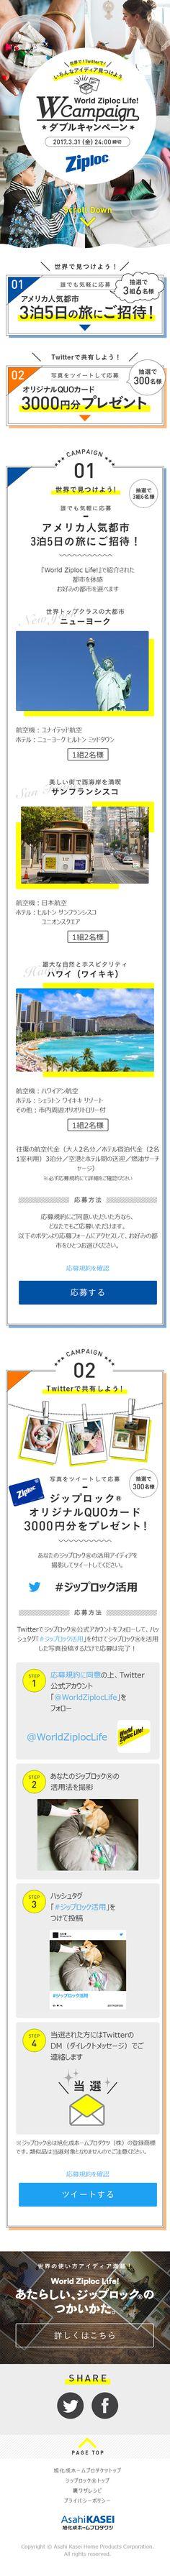 World Ziploc Life! ダブルキャンペーン【日用雑貨関連】のLPデザイン。WEBデザイナーさん必見!スマホランディングページのデザイン参考に(シンプル系) Webpage Layout, Web Layout, Blog Design, Web Design Inspiration, Brownies, Graph Design, Web Japan, Ui Web, Magazine Design